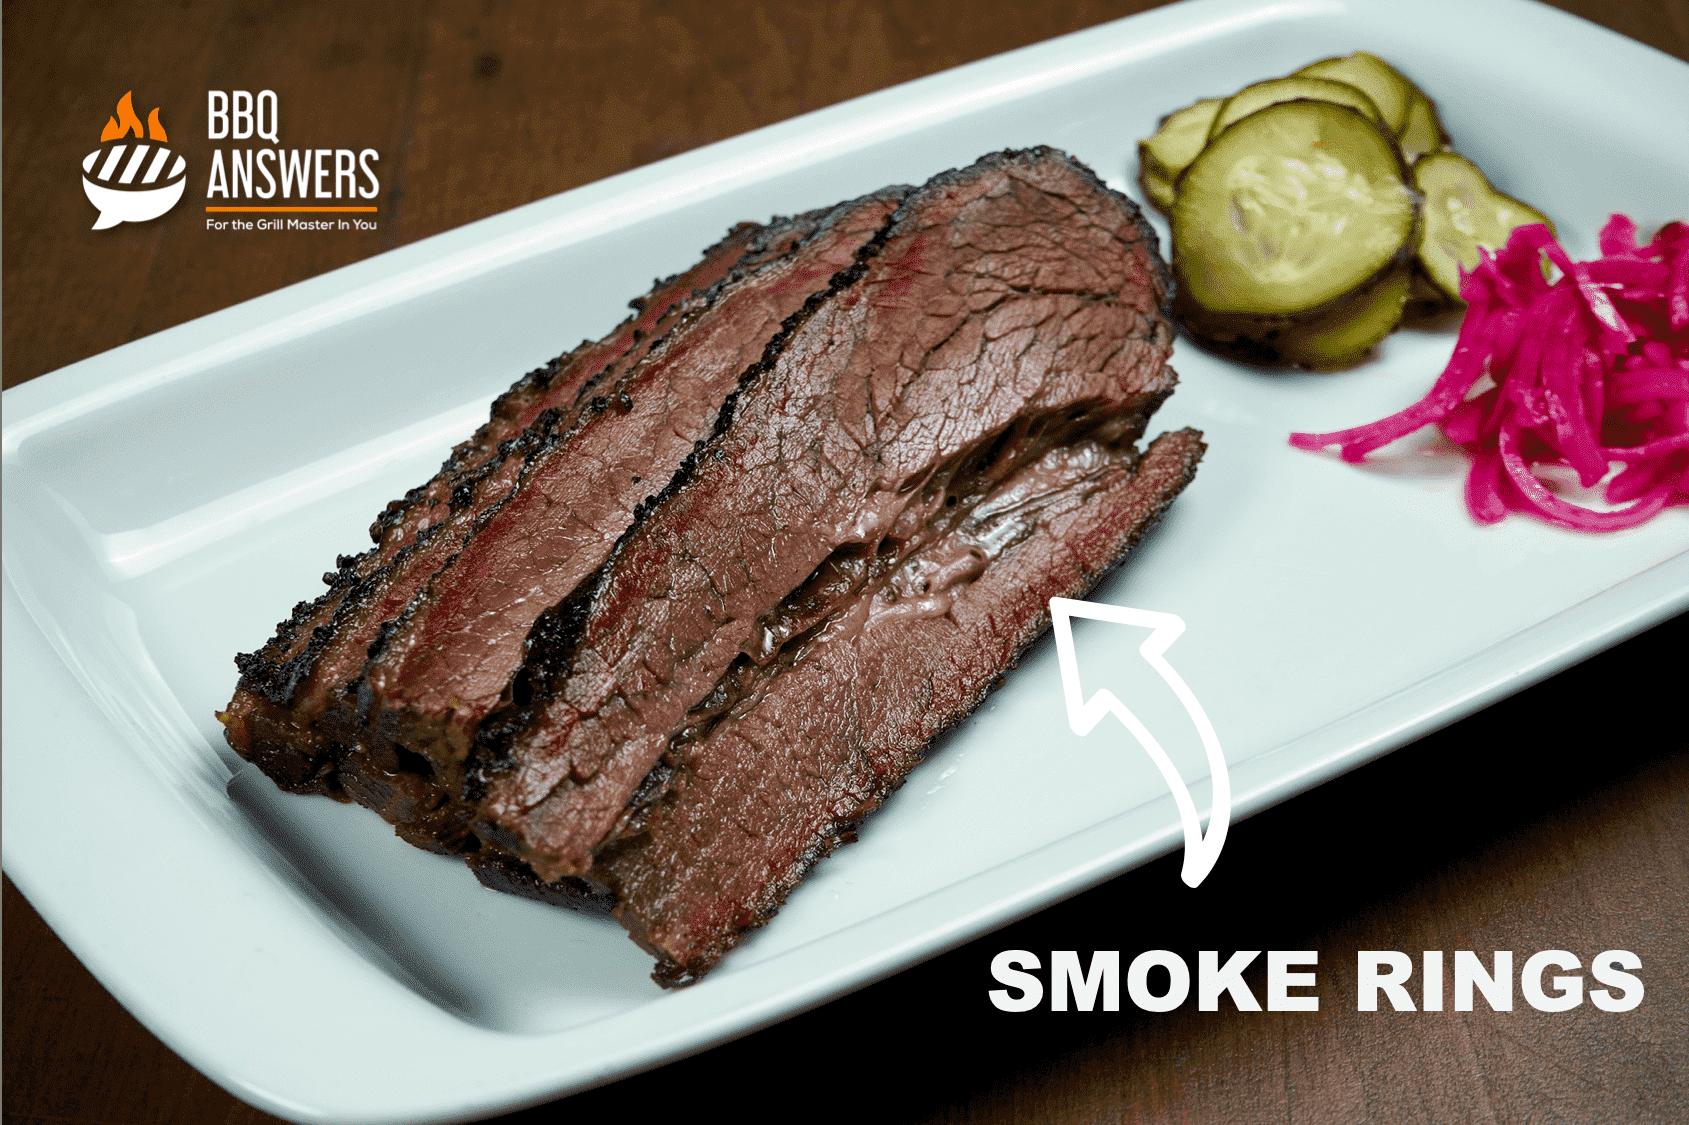 Smoked Brisket with Smoke Rings   BBQanswers